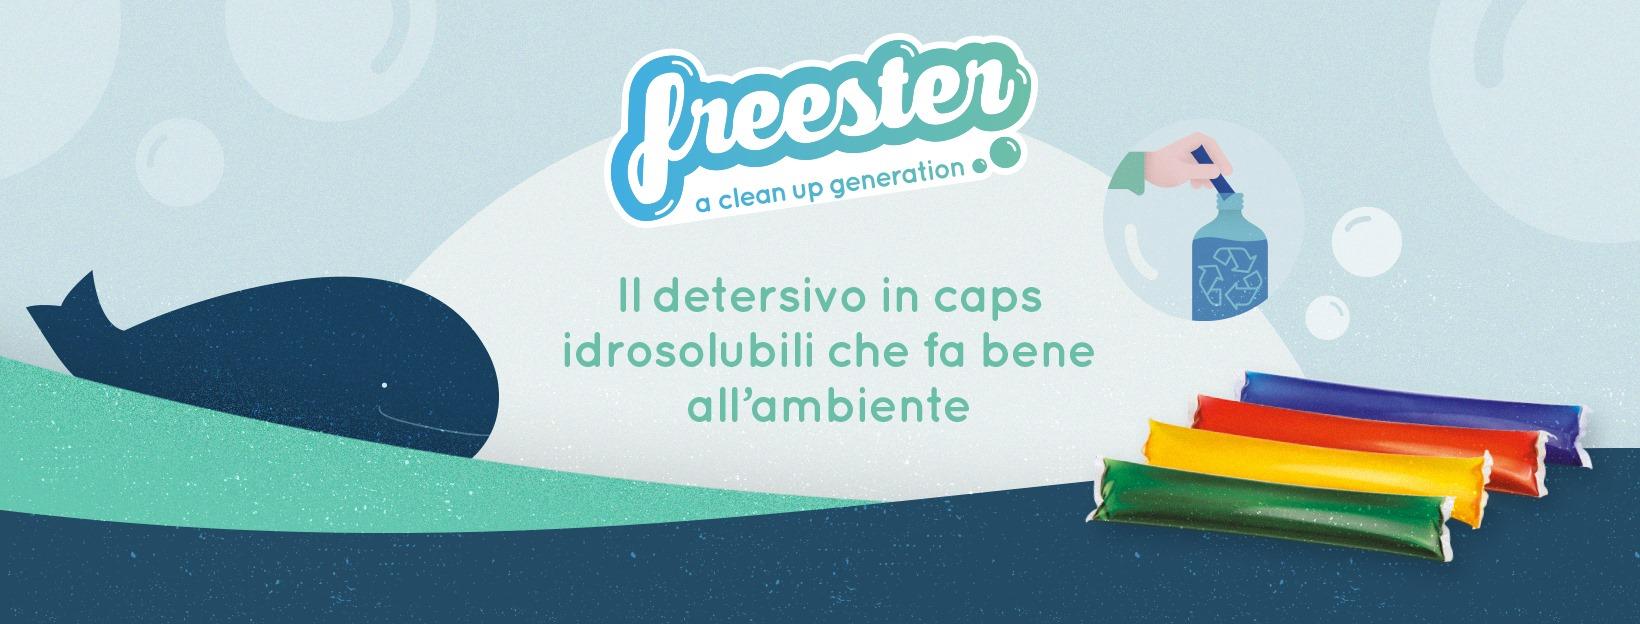 Freester